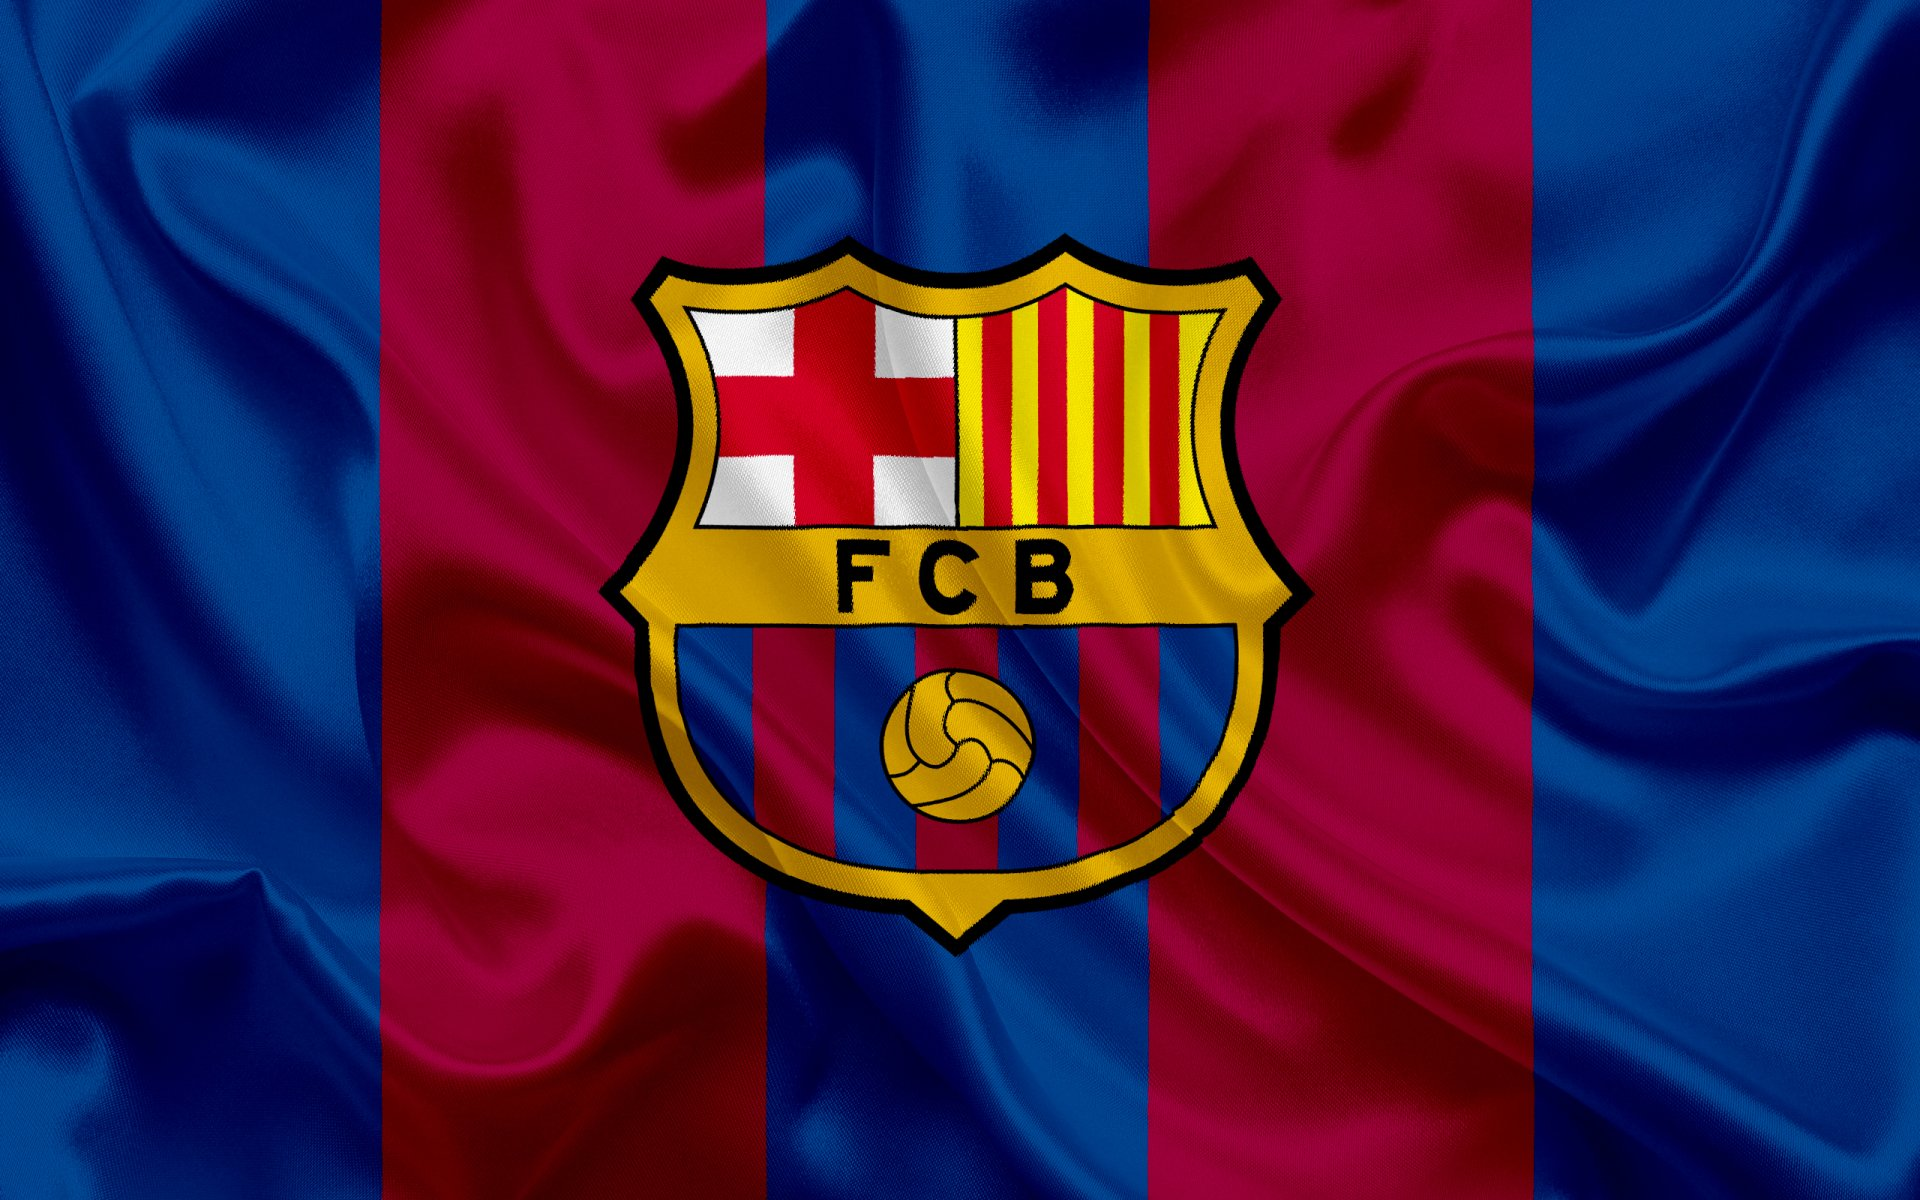 Barça Logo Fond d'écran HD | Arrière-Plan | 2560x1600 | ID:969500 - Wallpaper Abyss